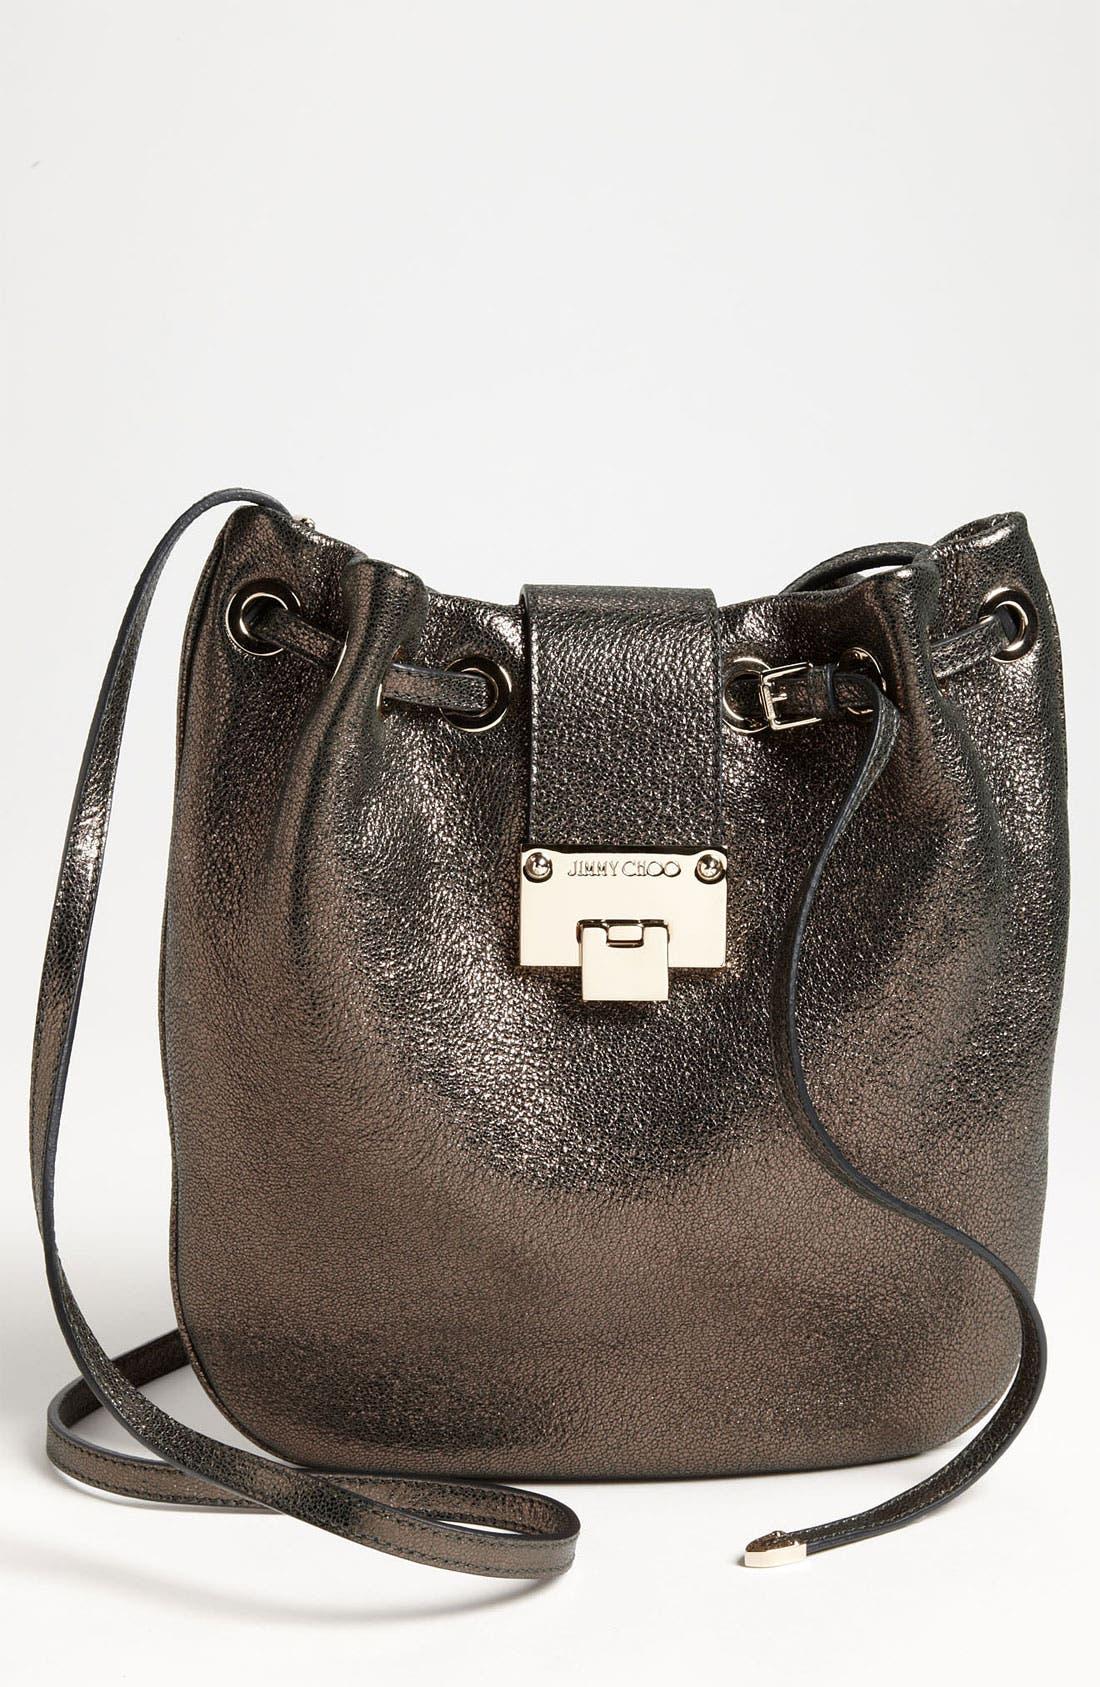 Main Image - Jimmy Choo 'Ryad' Glitter Leather Crossbody Bag